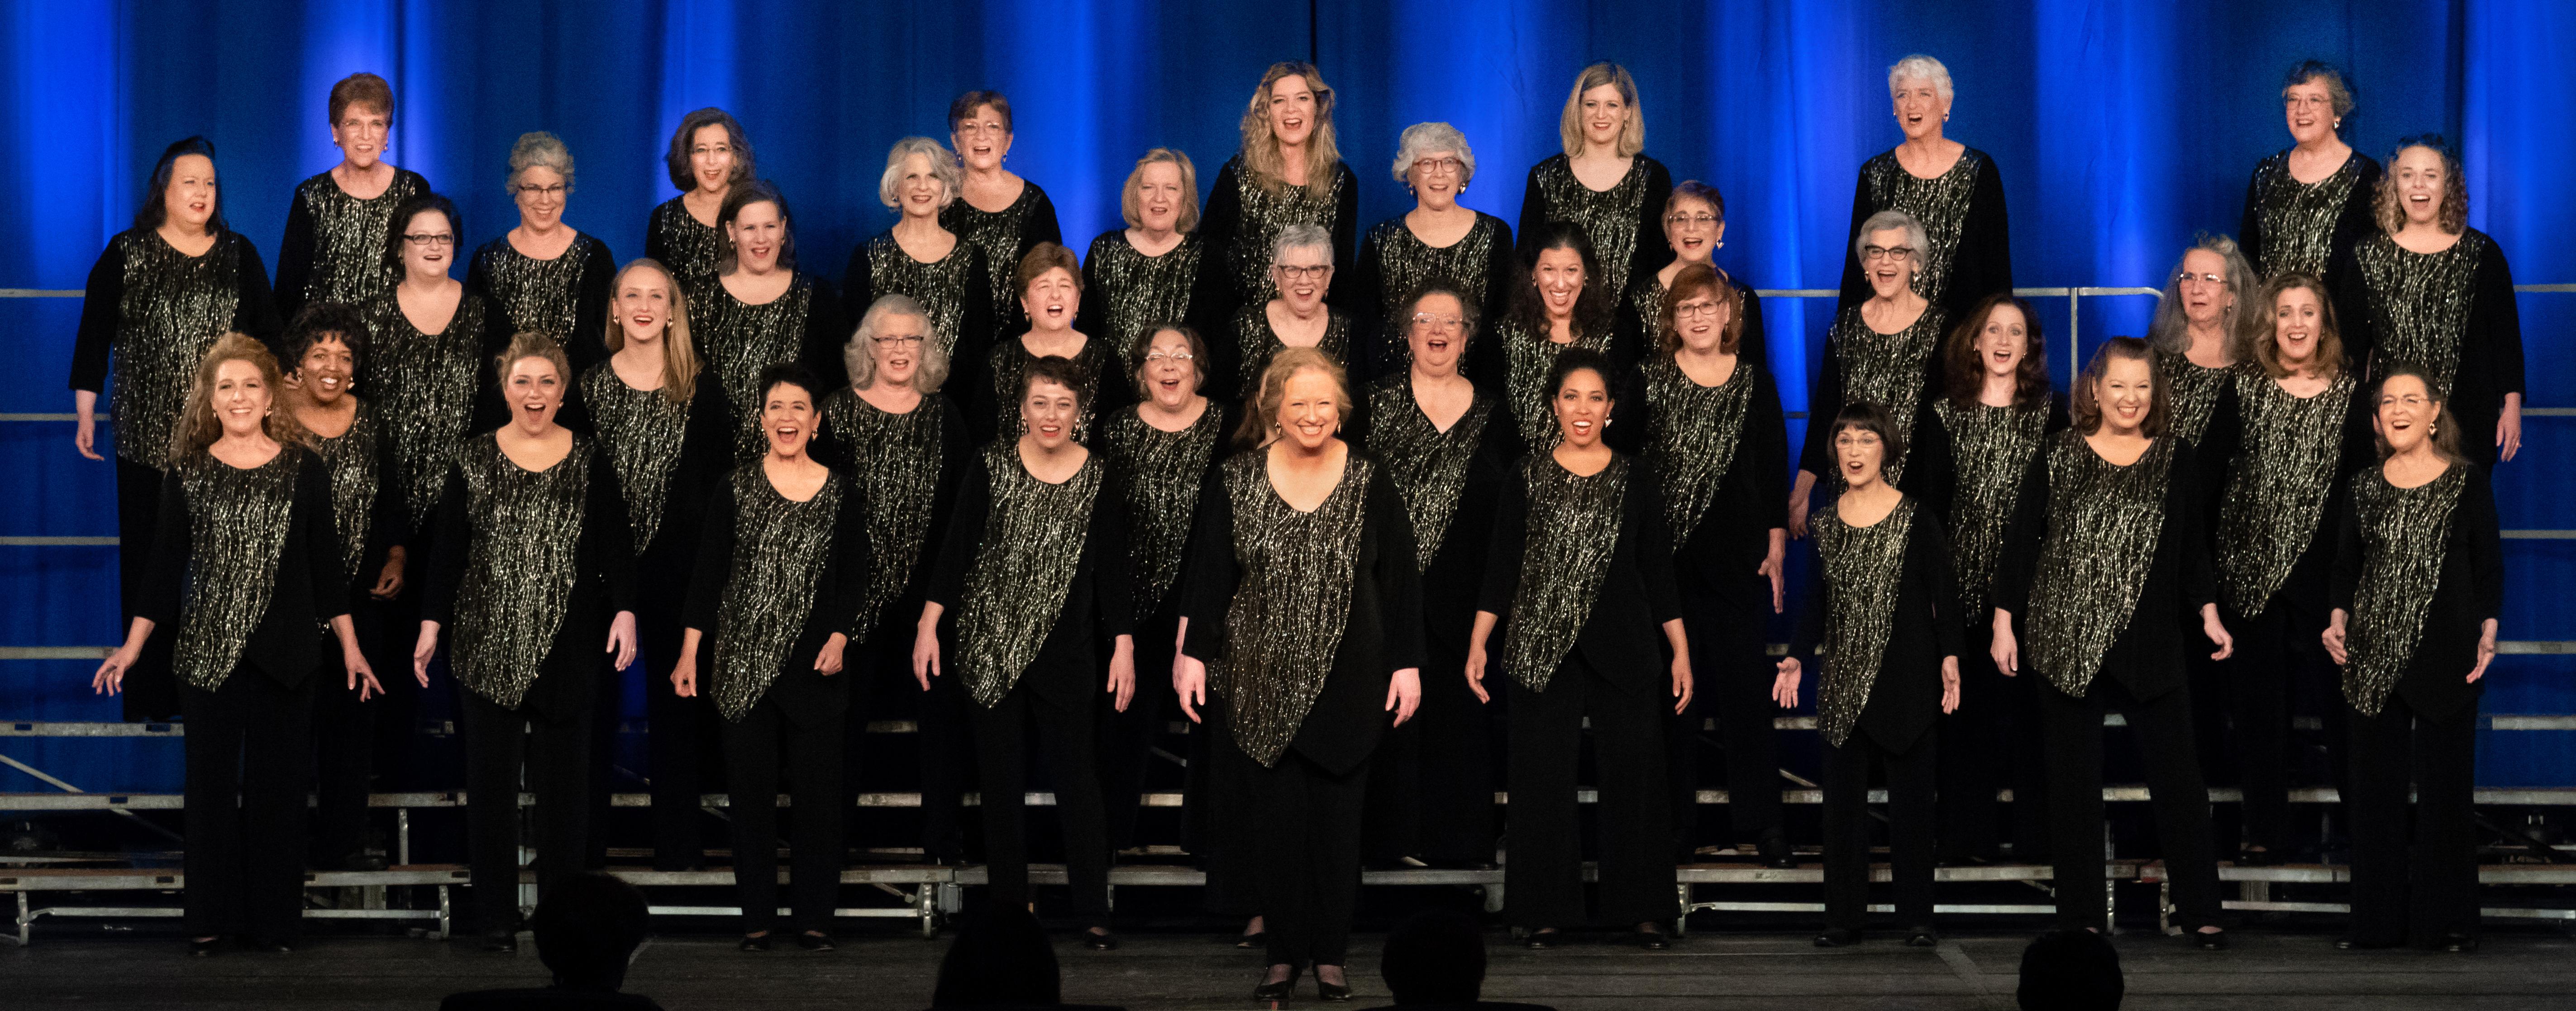 chorus-742